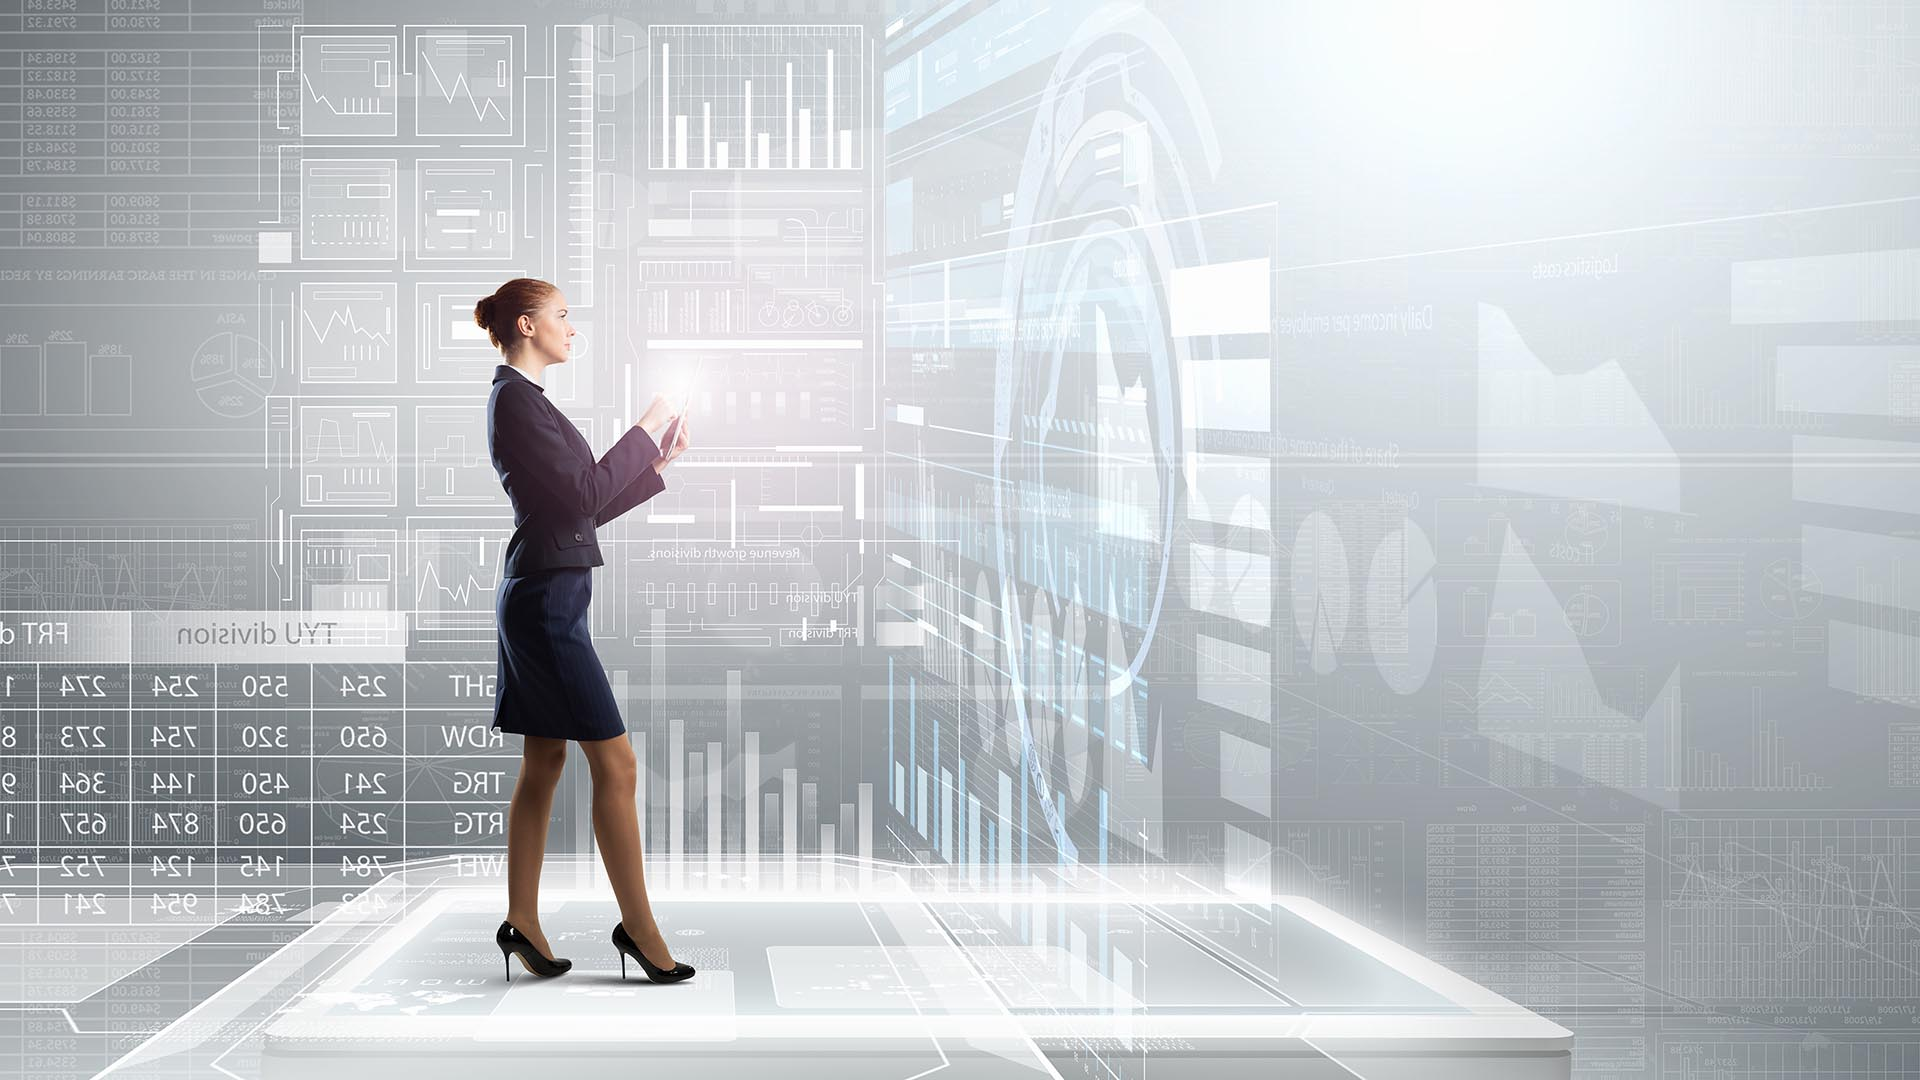 Agile Automations Case Studies Background